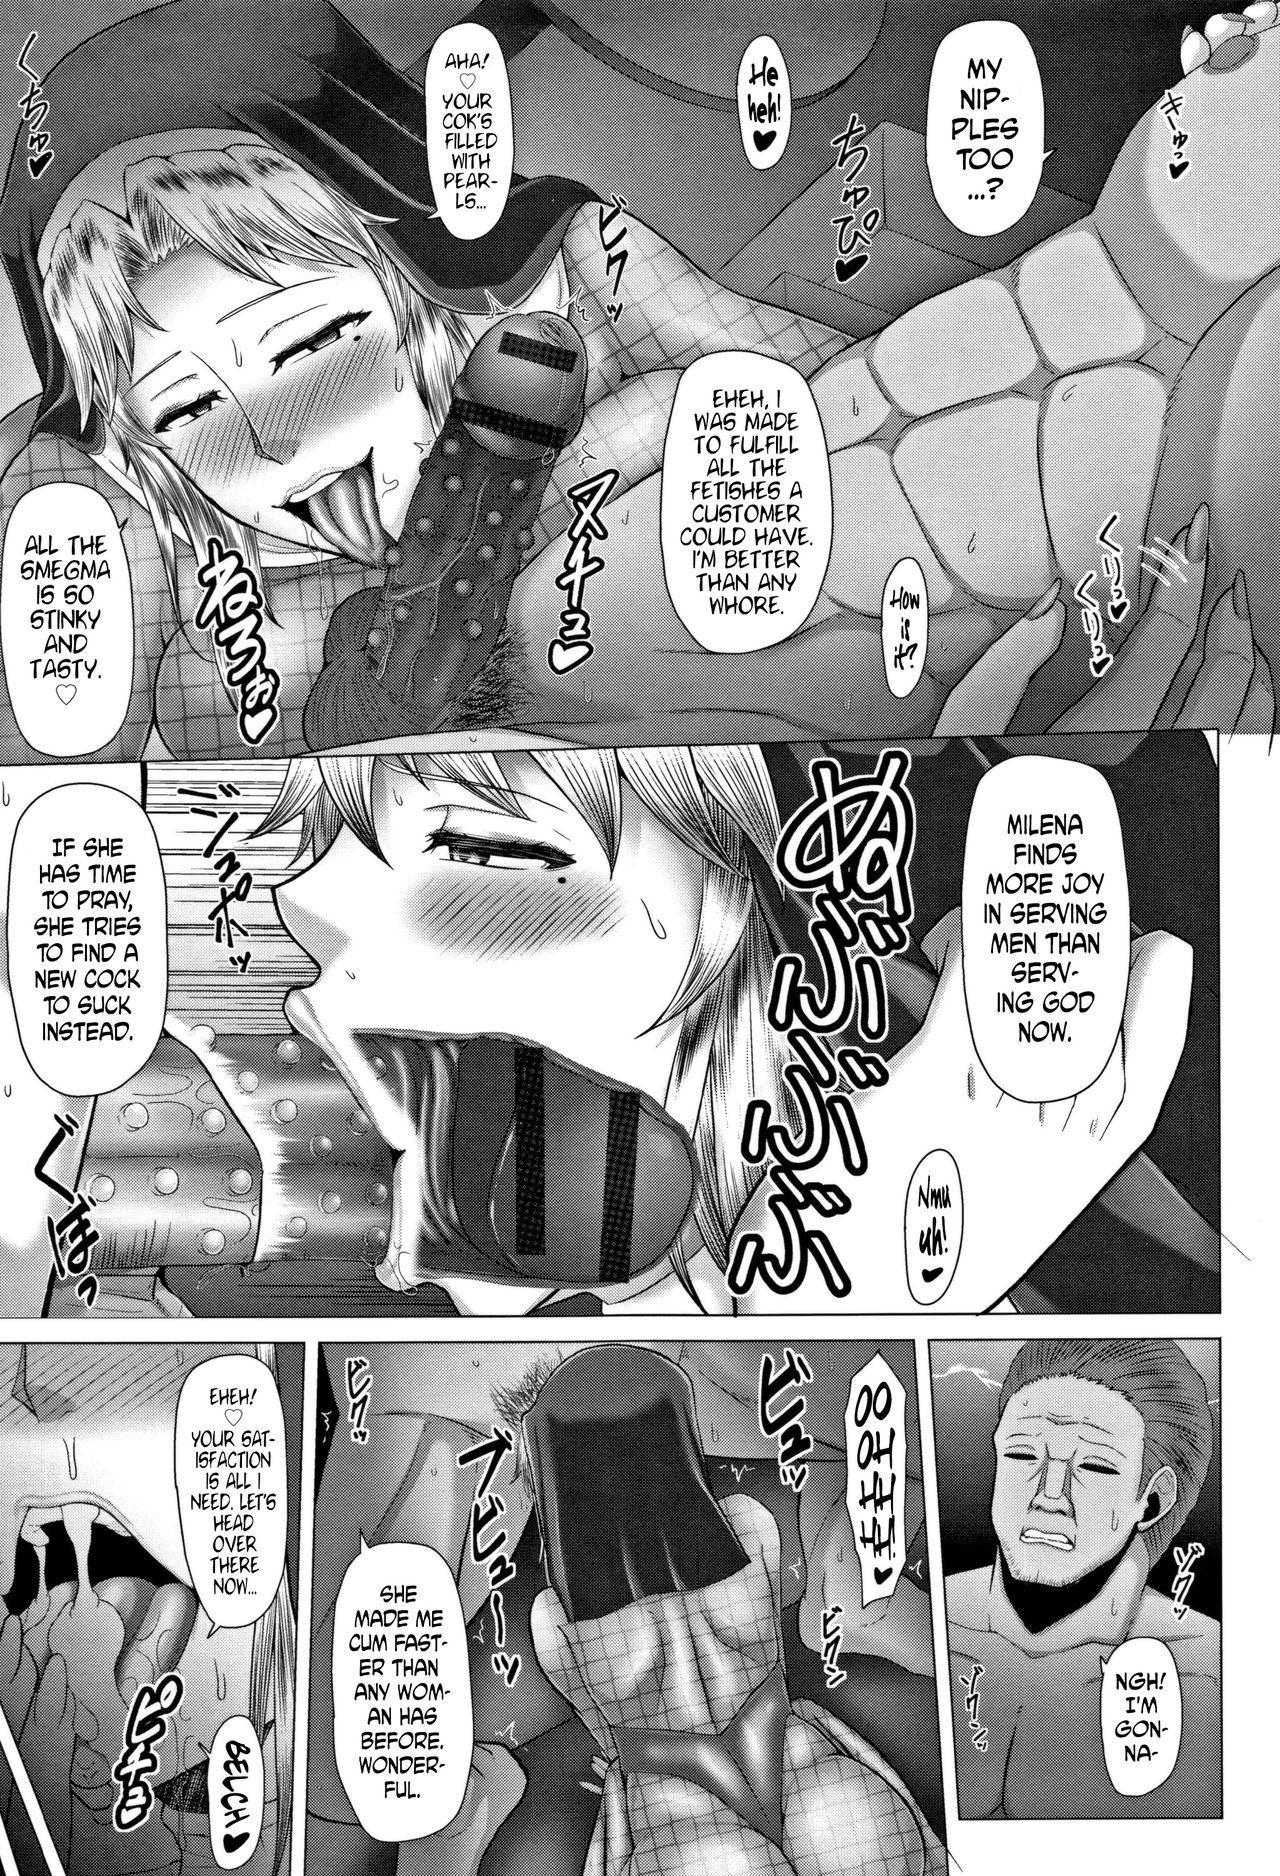 [Inoue Nanaki] Joushiki Daha! Kuro Gal Bitch-ka Seikatsu Ch. 1-3, 5-8 [English] [Dark Mac + N04h] 52